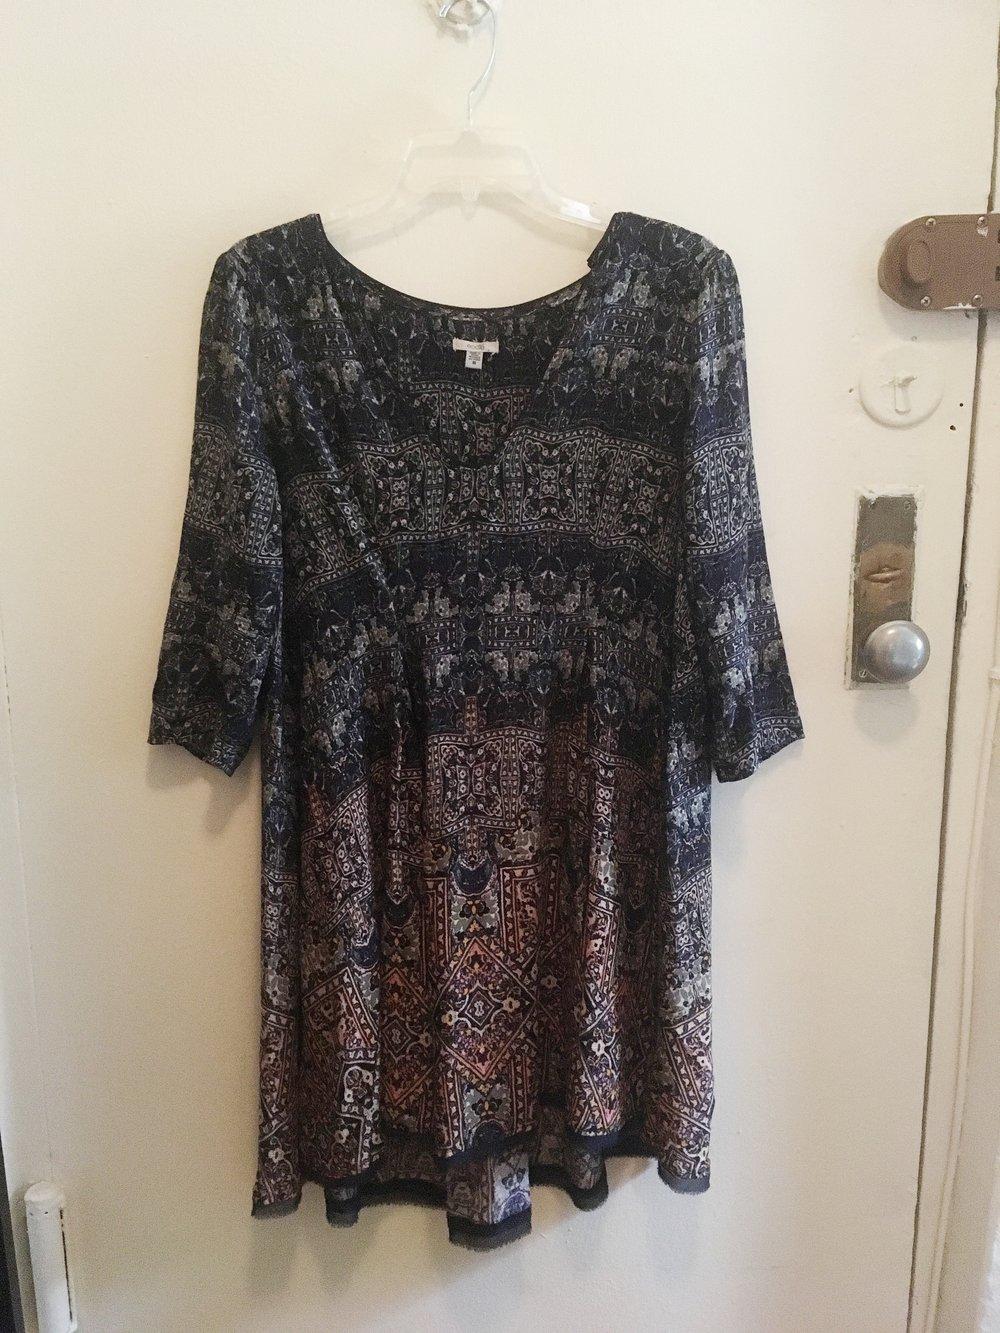 3/4 Sleeve Print Dress, $20